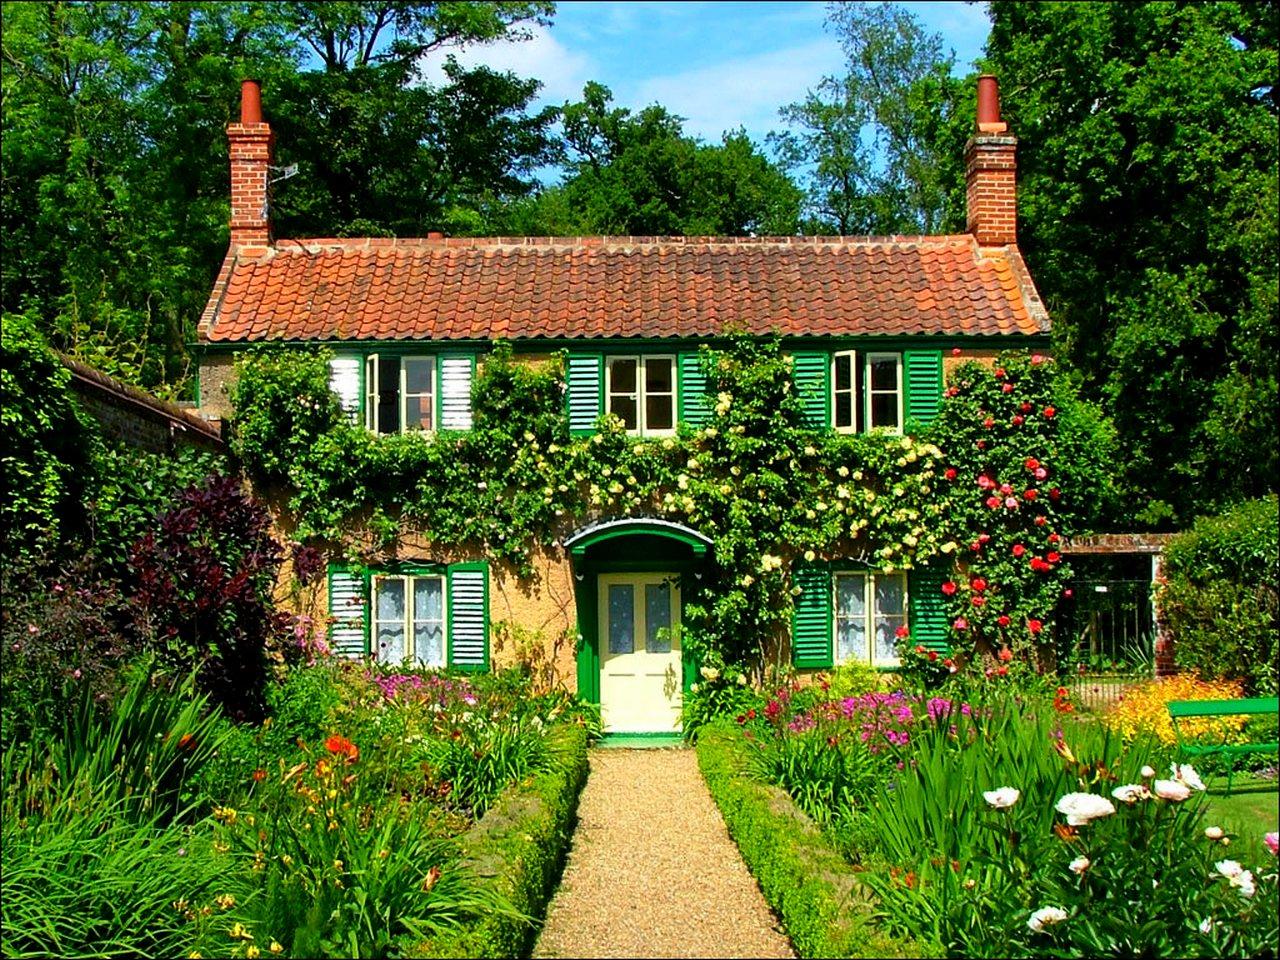 countryside home lien brilleslijper - HD1280×960